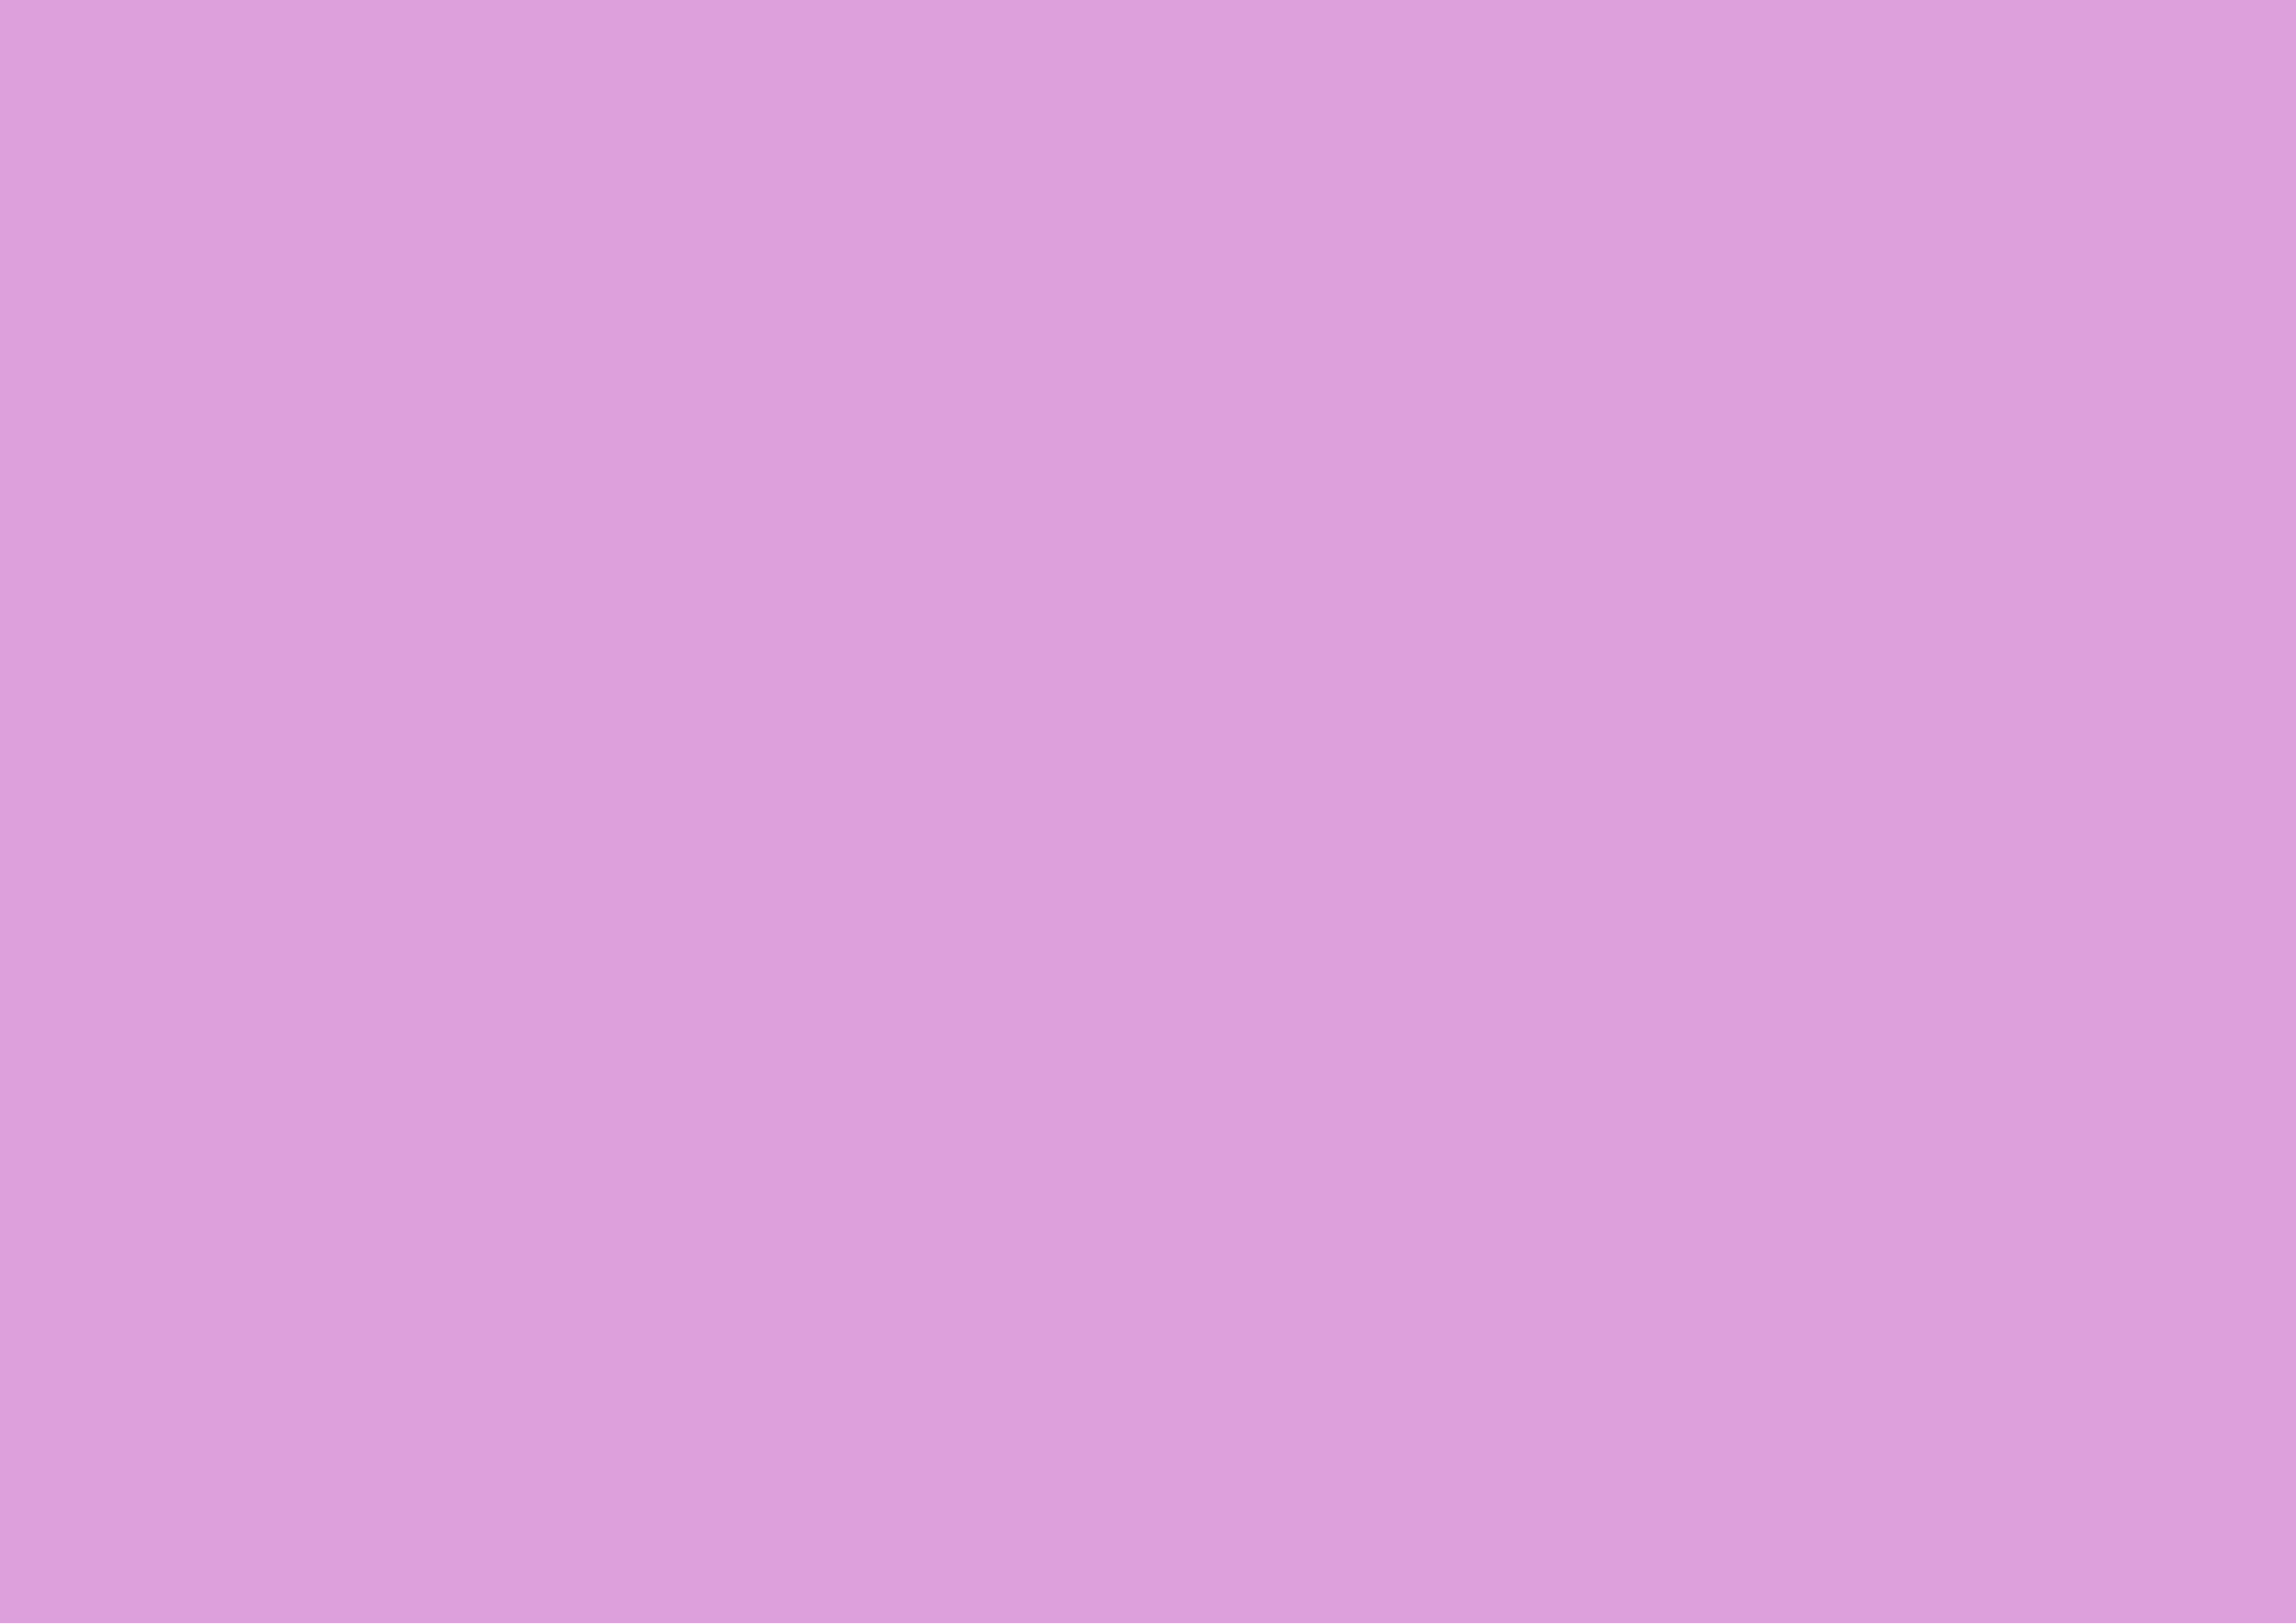 3508x2480 Plum Web Solid Color Background